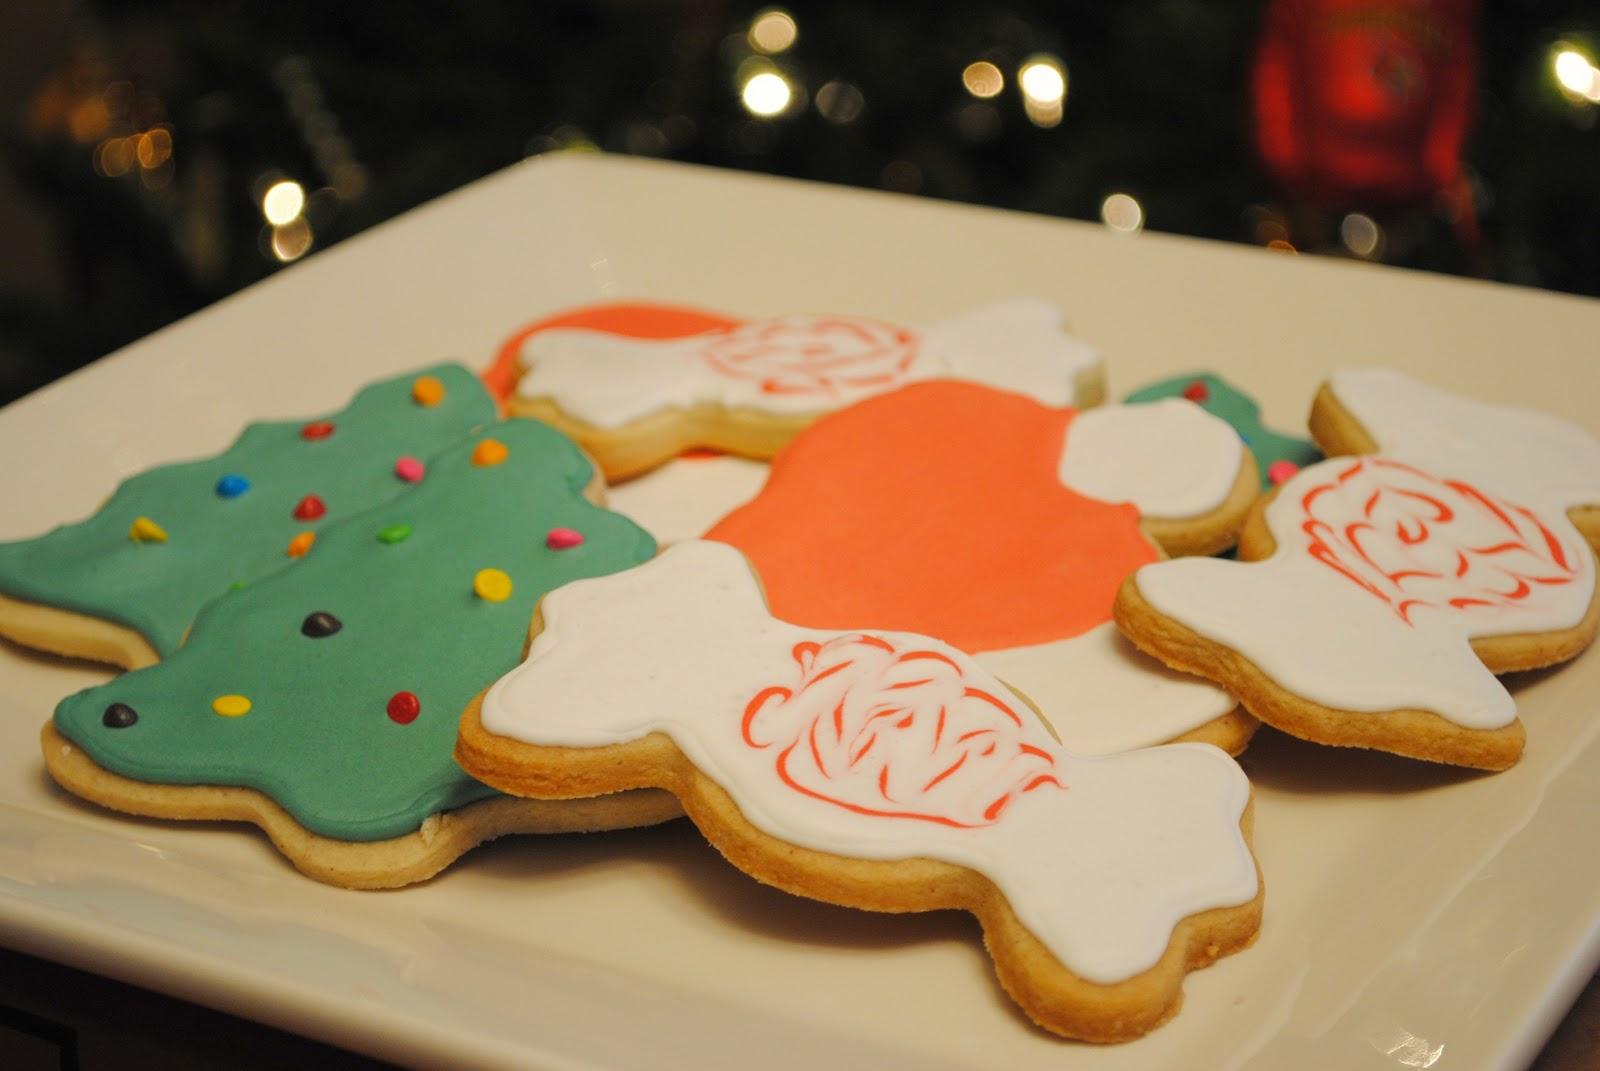 Homemade By Holman Spiced Brown Sugar Christmas Cookies